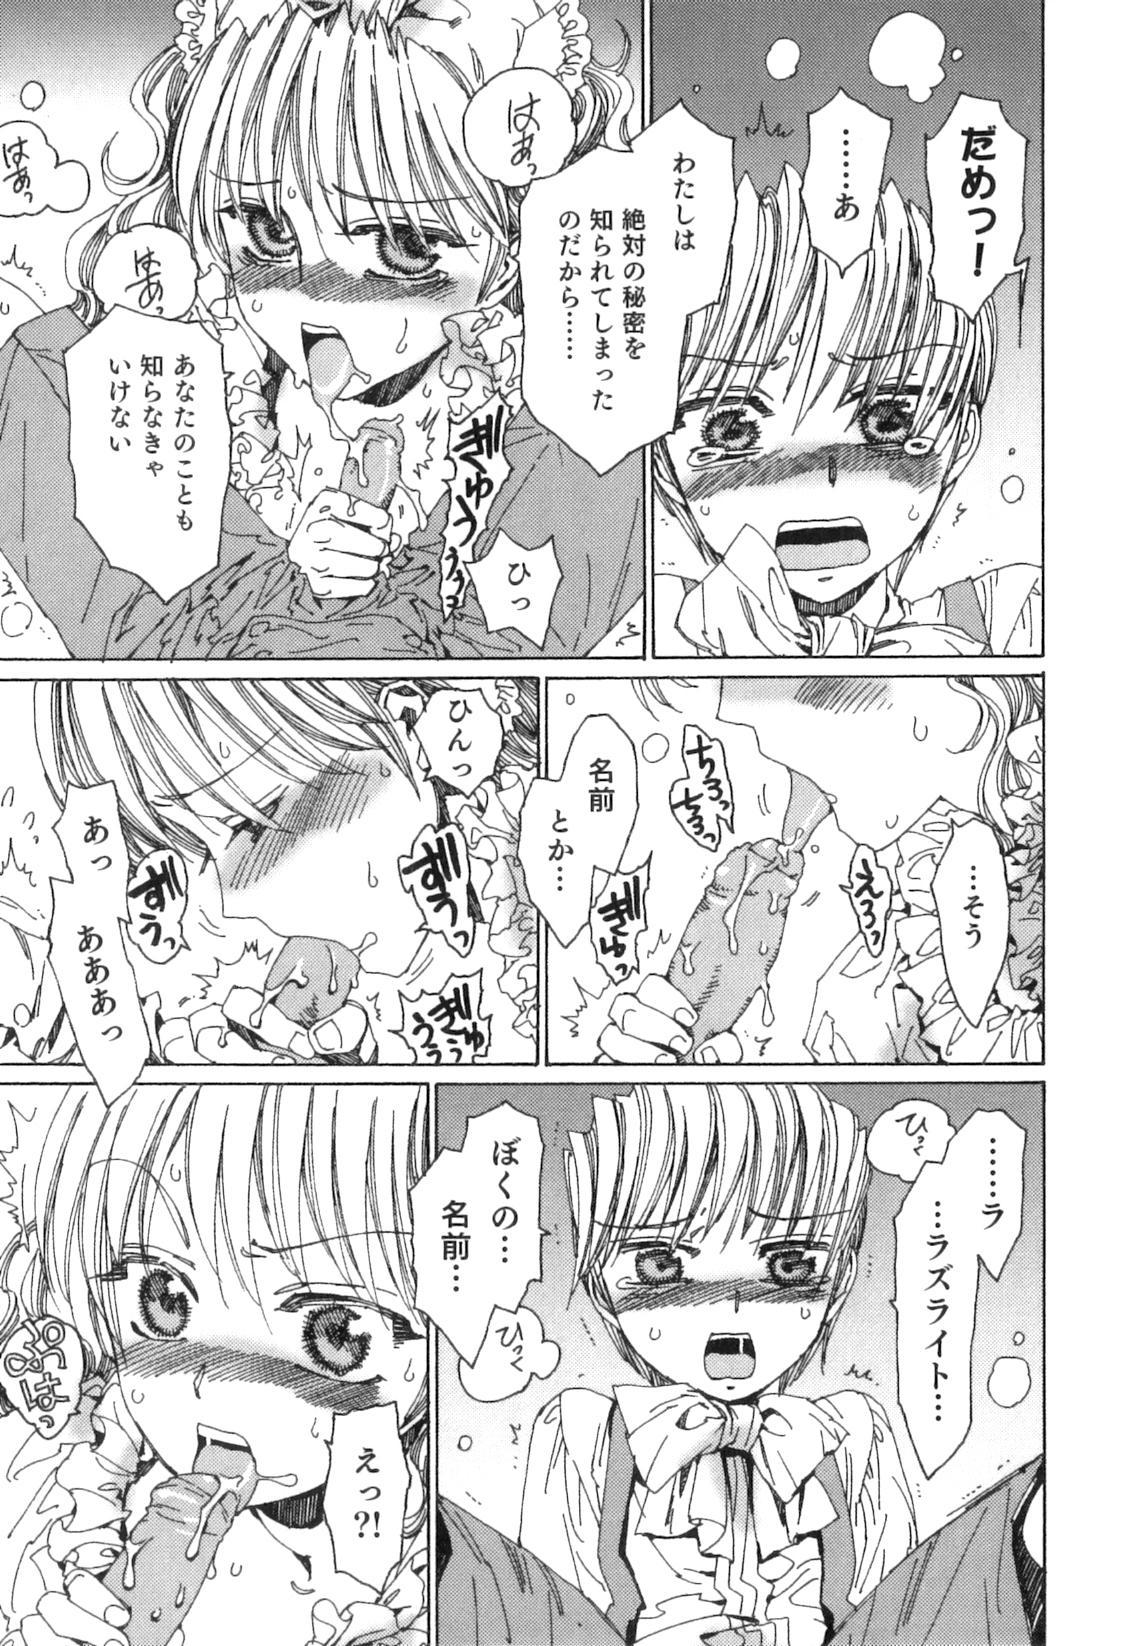 Yuni-Hapi 155